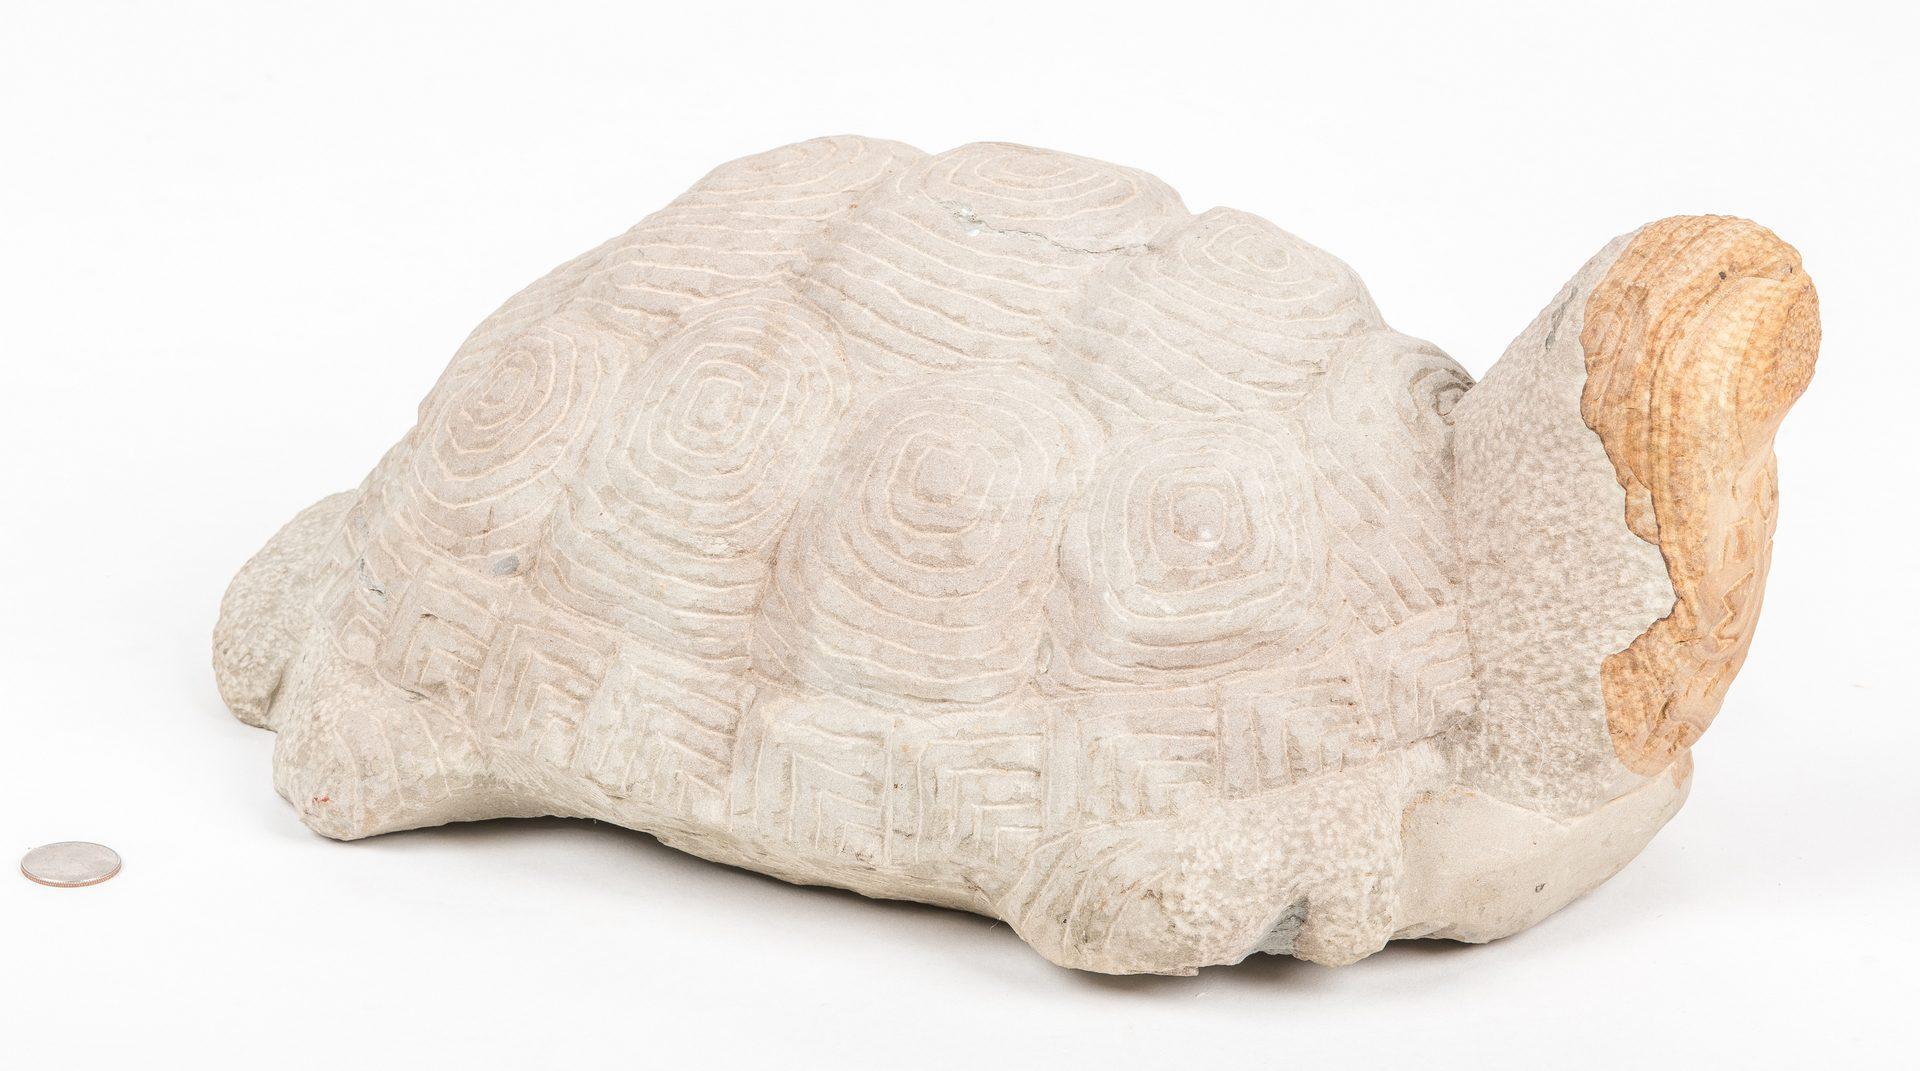 Lot 716: Tim Lewis Carved Limestone Turtle Sculpture